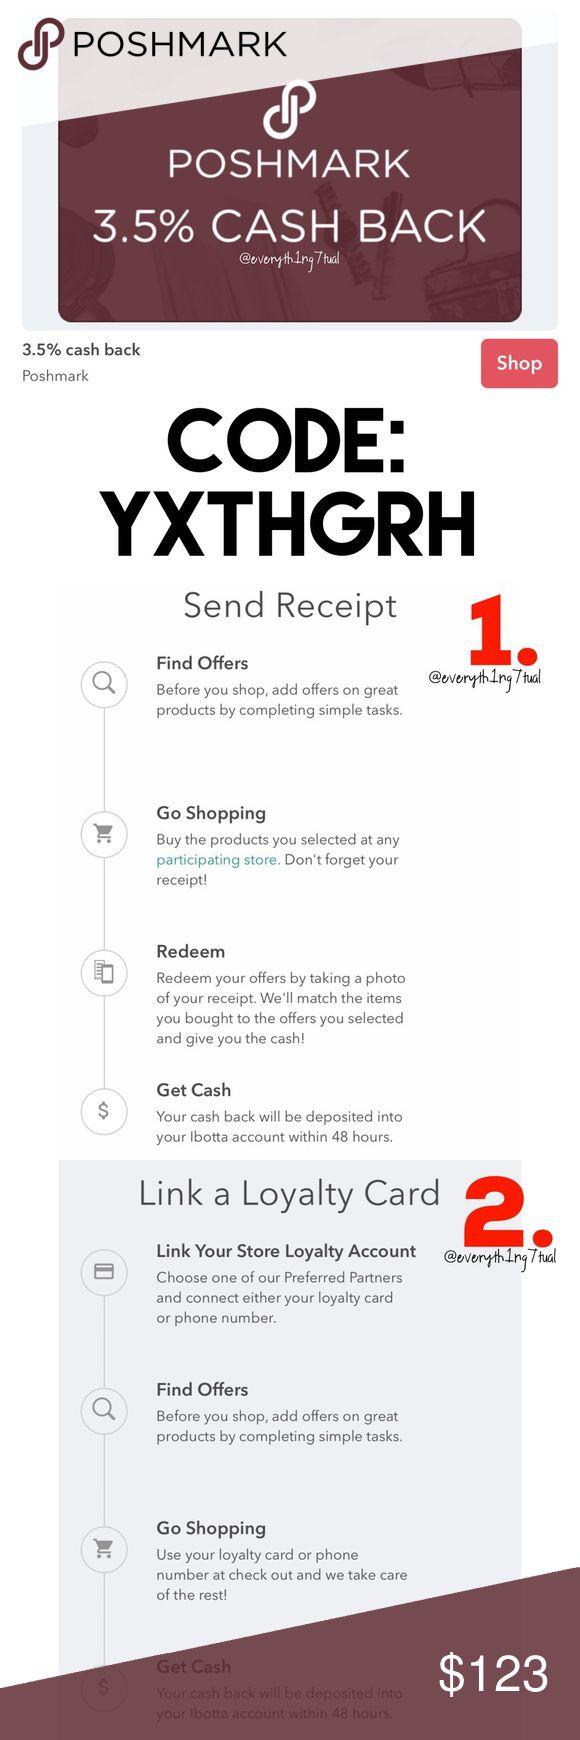 oltre 25 fantastiche idee su loyalty card app su pinterest